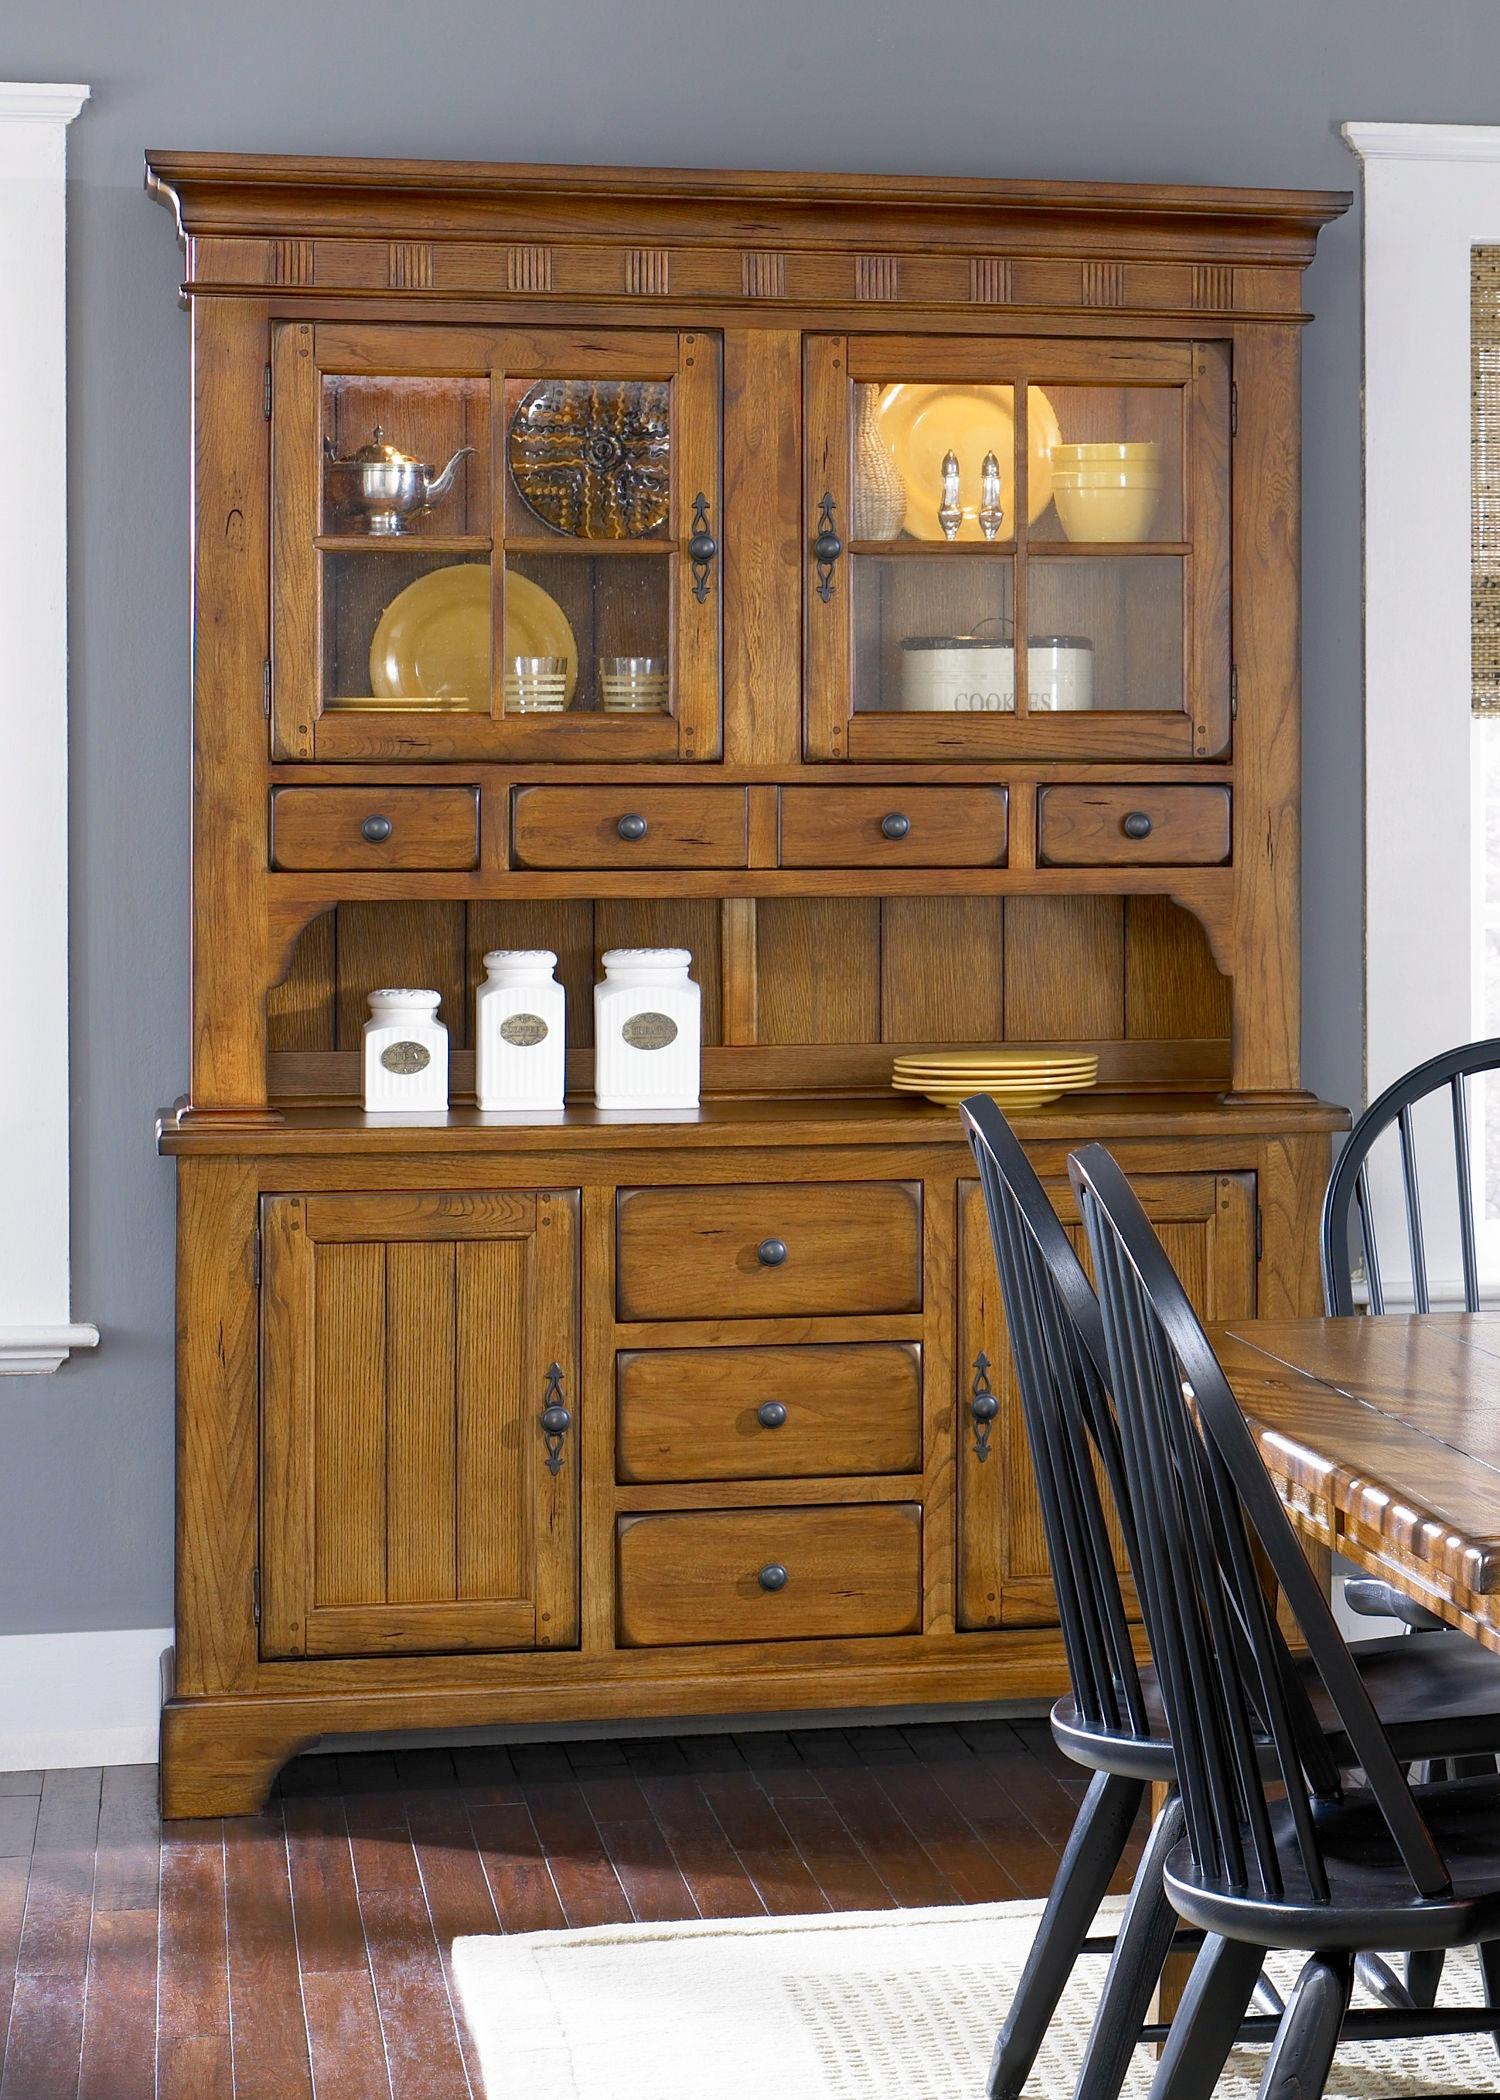 Liberty Furniture Dining Room Hutch - Oak  sc 1 st  A\u0026W Furniture & Liberty Furniture Dining Room Hutch - Oak 17-CH6285 - A\u0026W Furniture ...